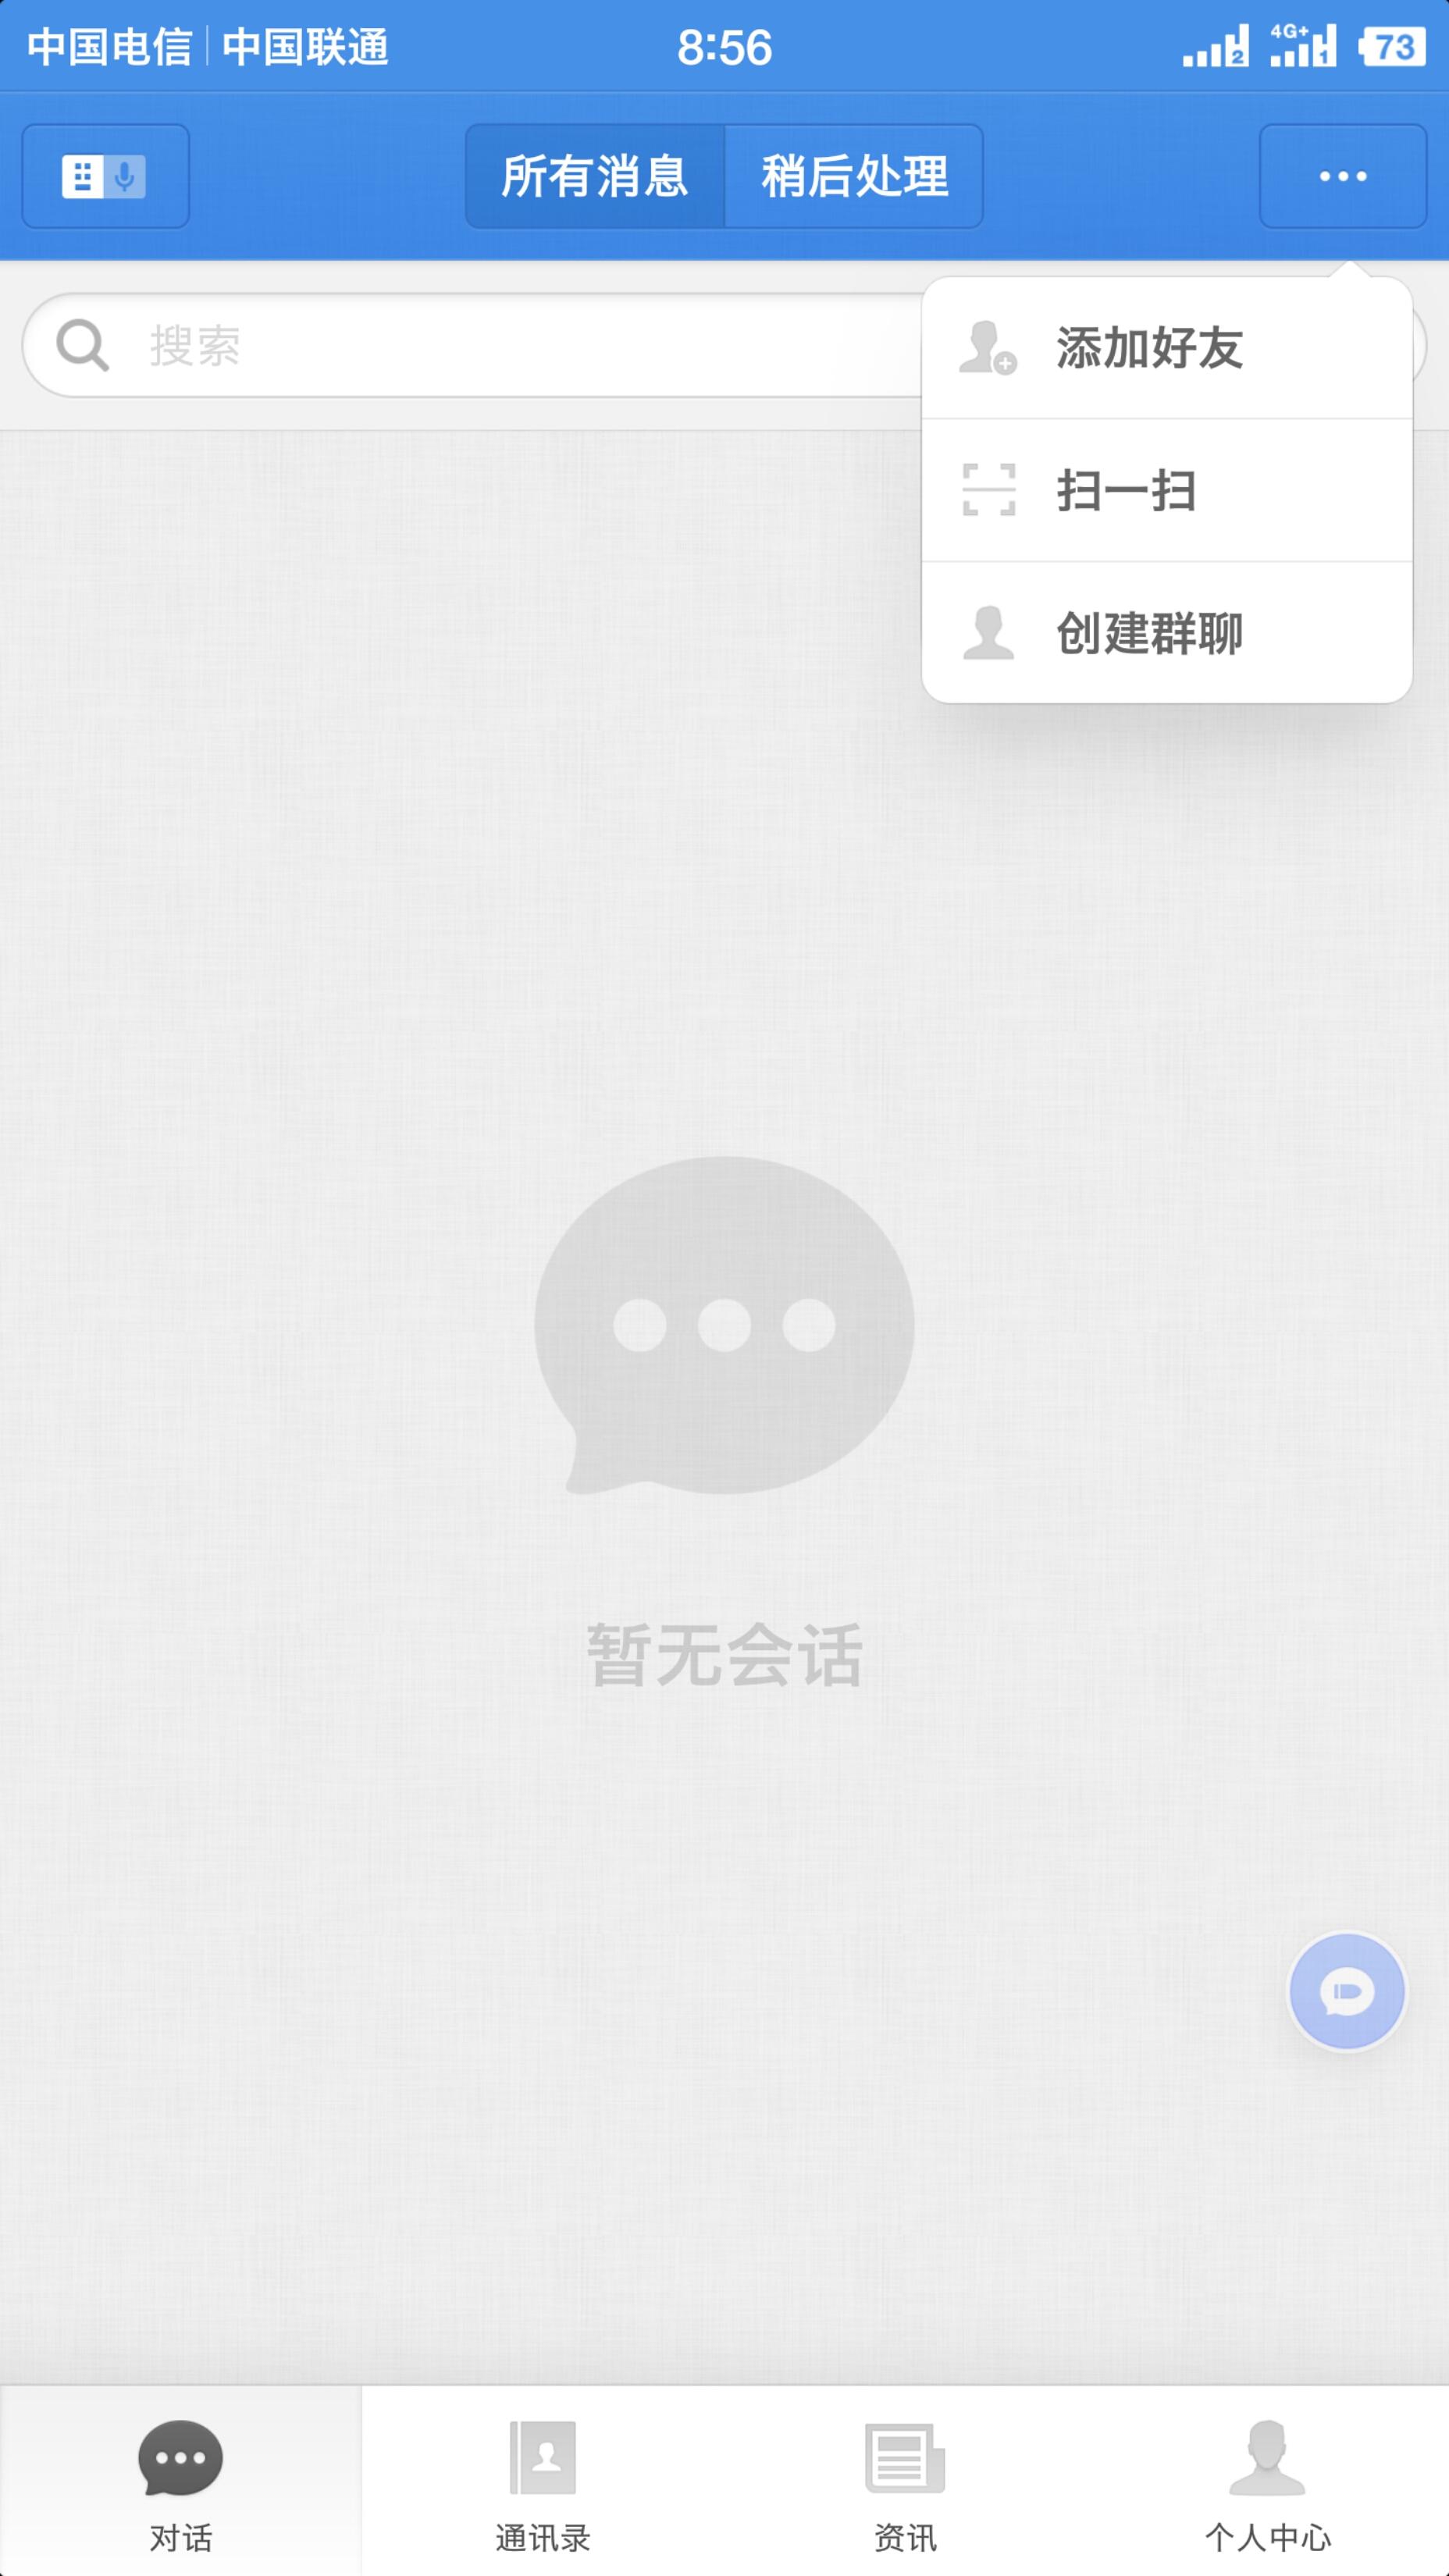 Screenshot_2018-05-27-08-56-26-699_????.png